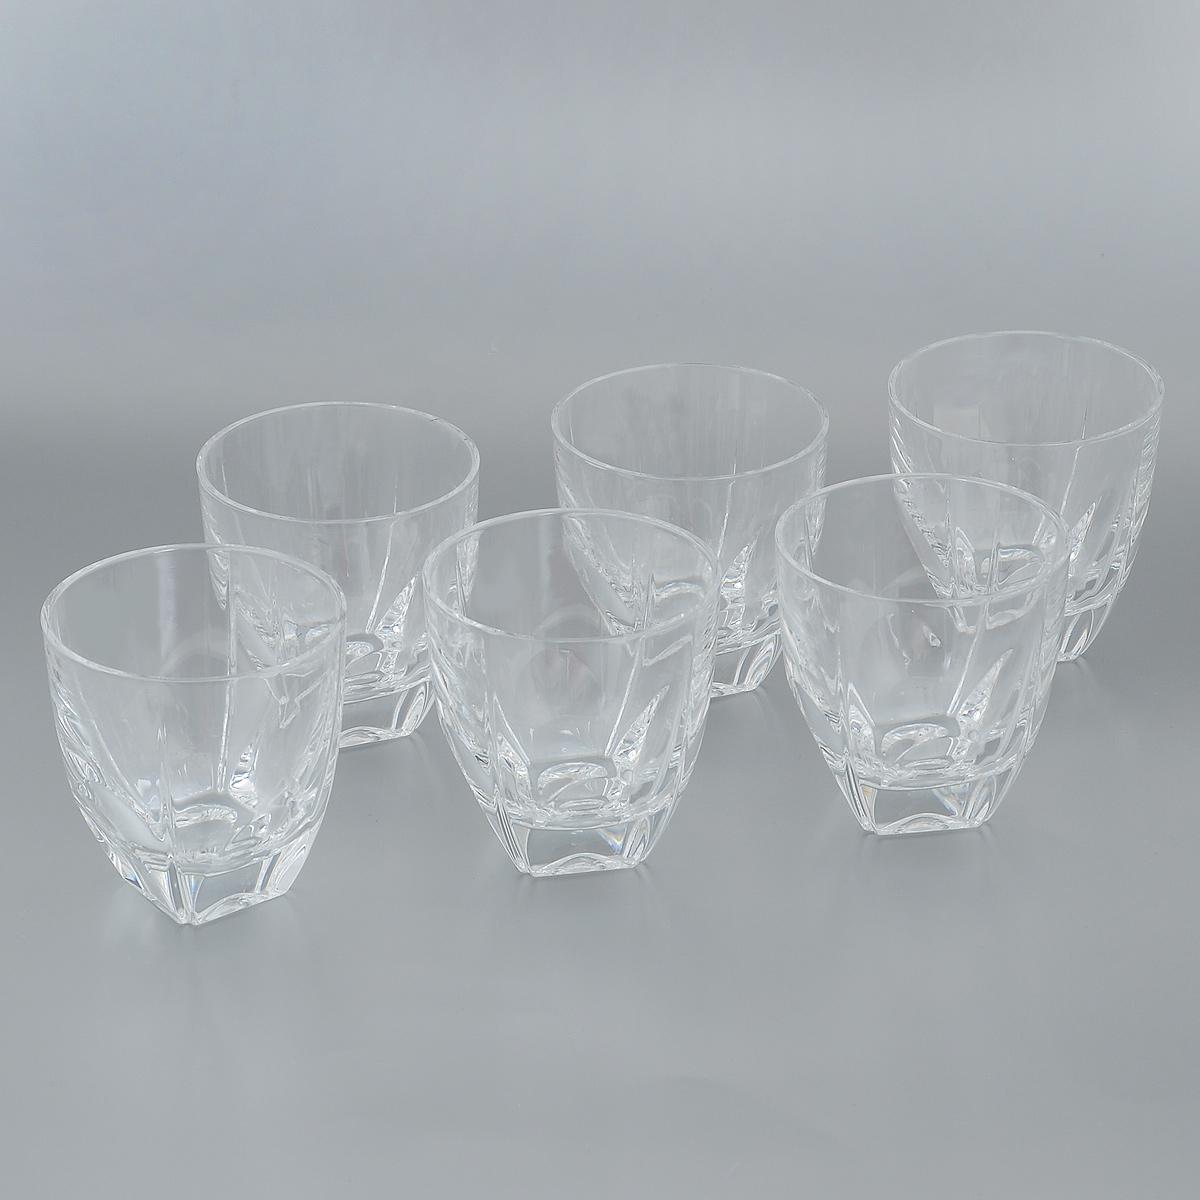 Фото - Набор стаканов Crystal Bohemia, 270 мл, 6 шт набор стаканов crystal bohemia 270 мл 6 шт